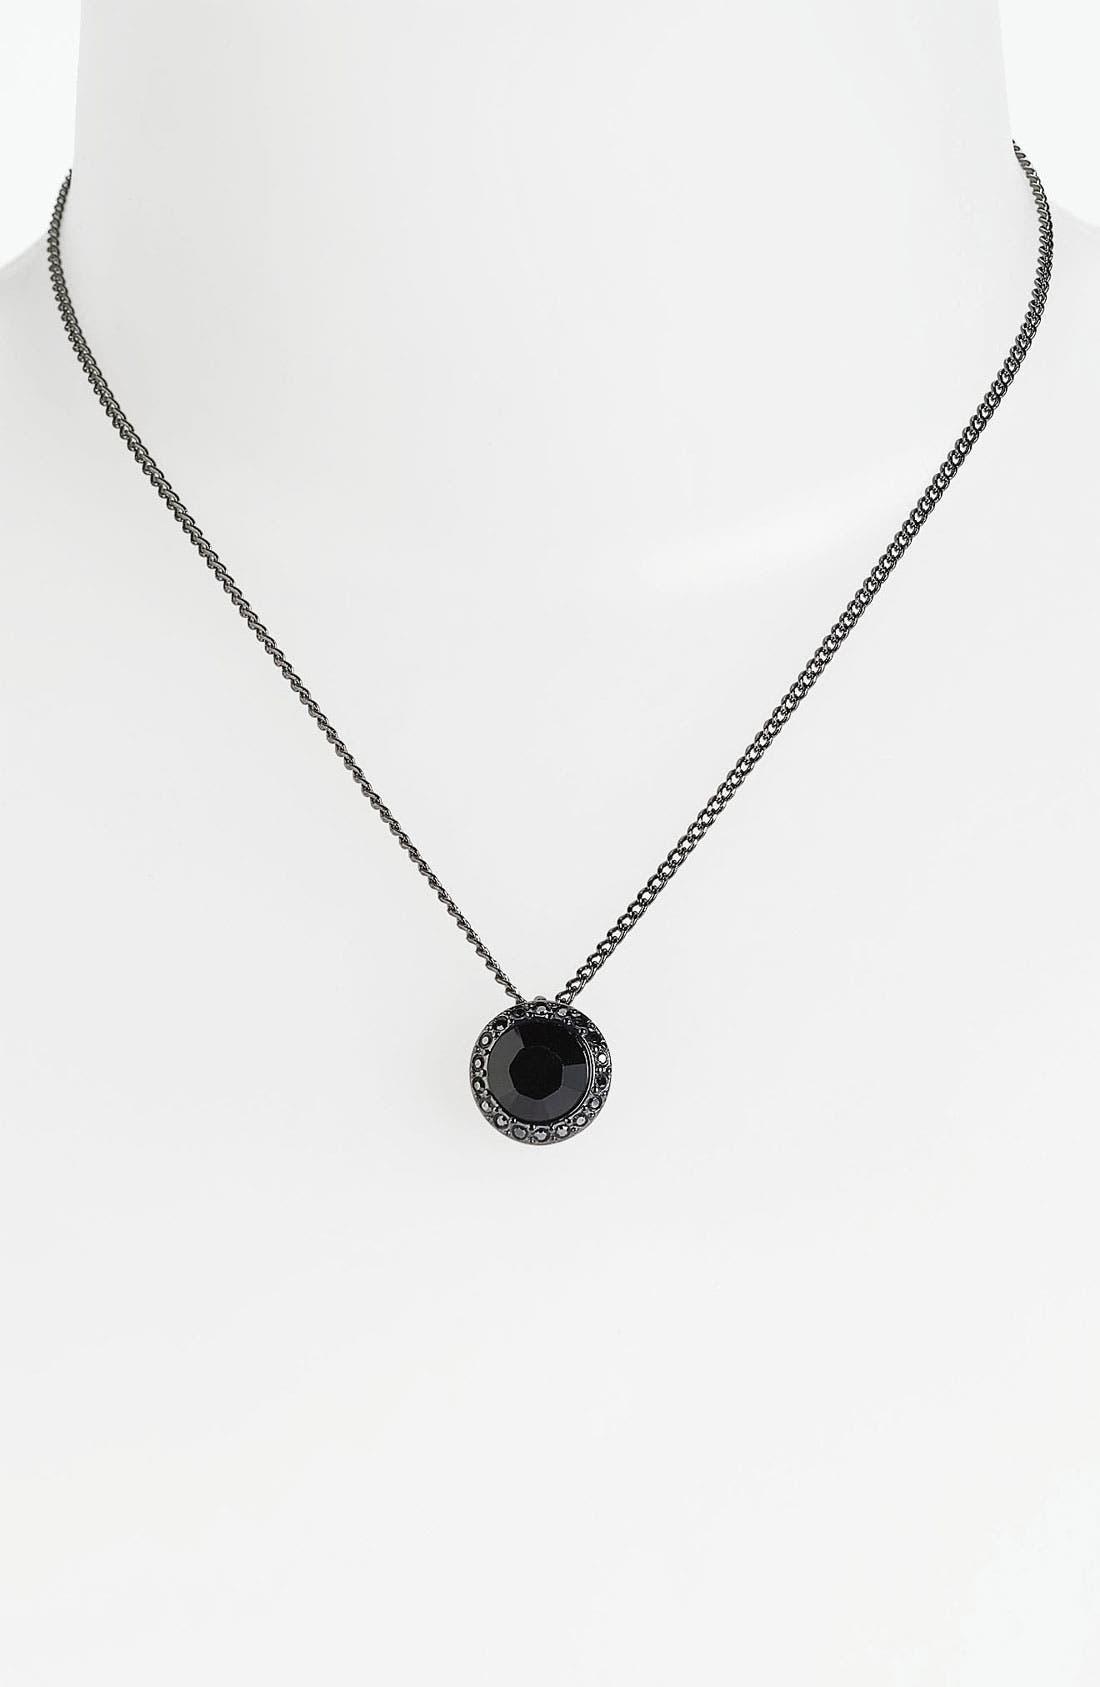 Main Image - Givenchy Pendant Necklace